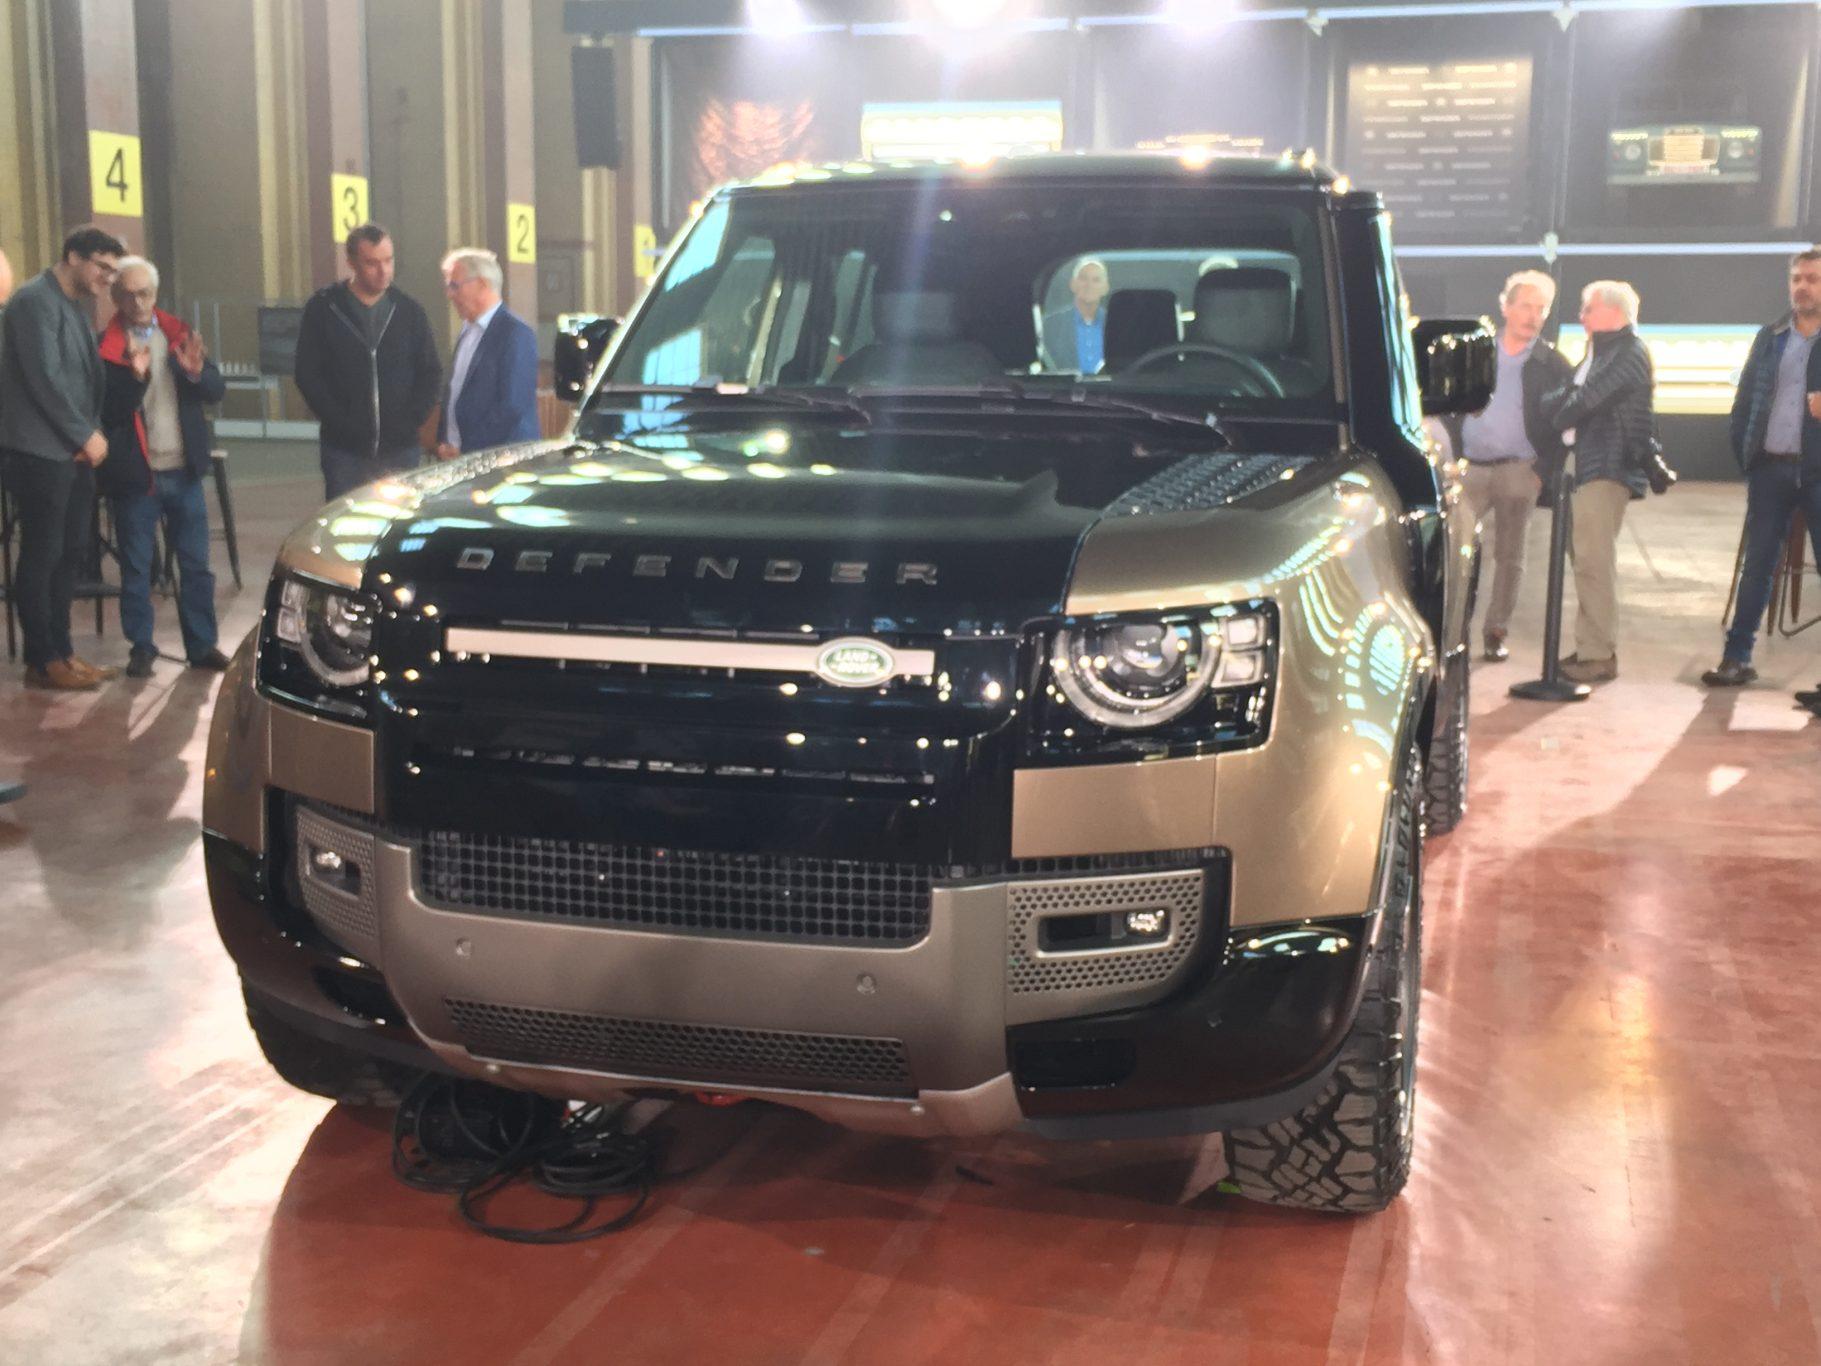 Présentation : The all-new Land Rover Defender